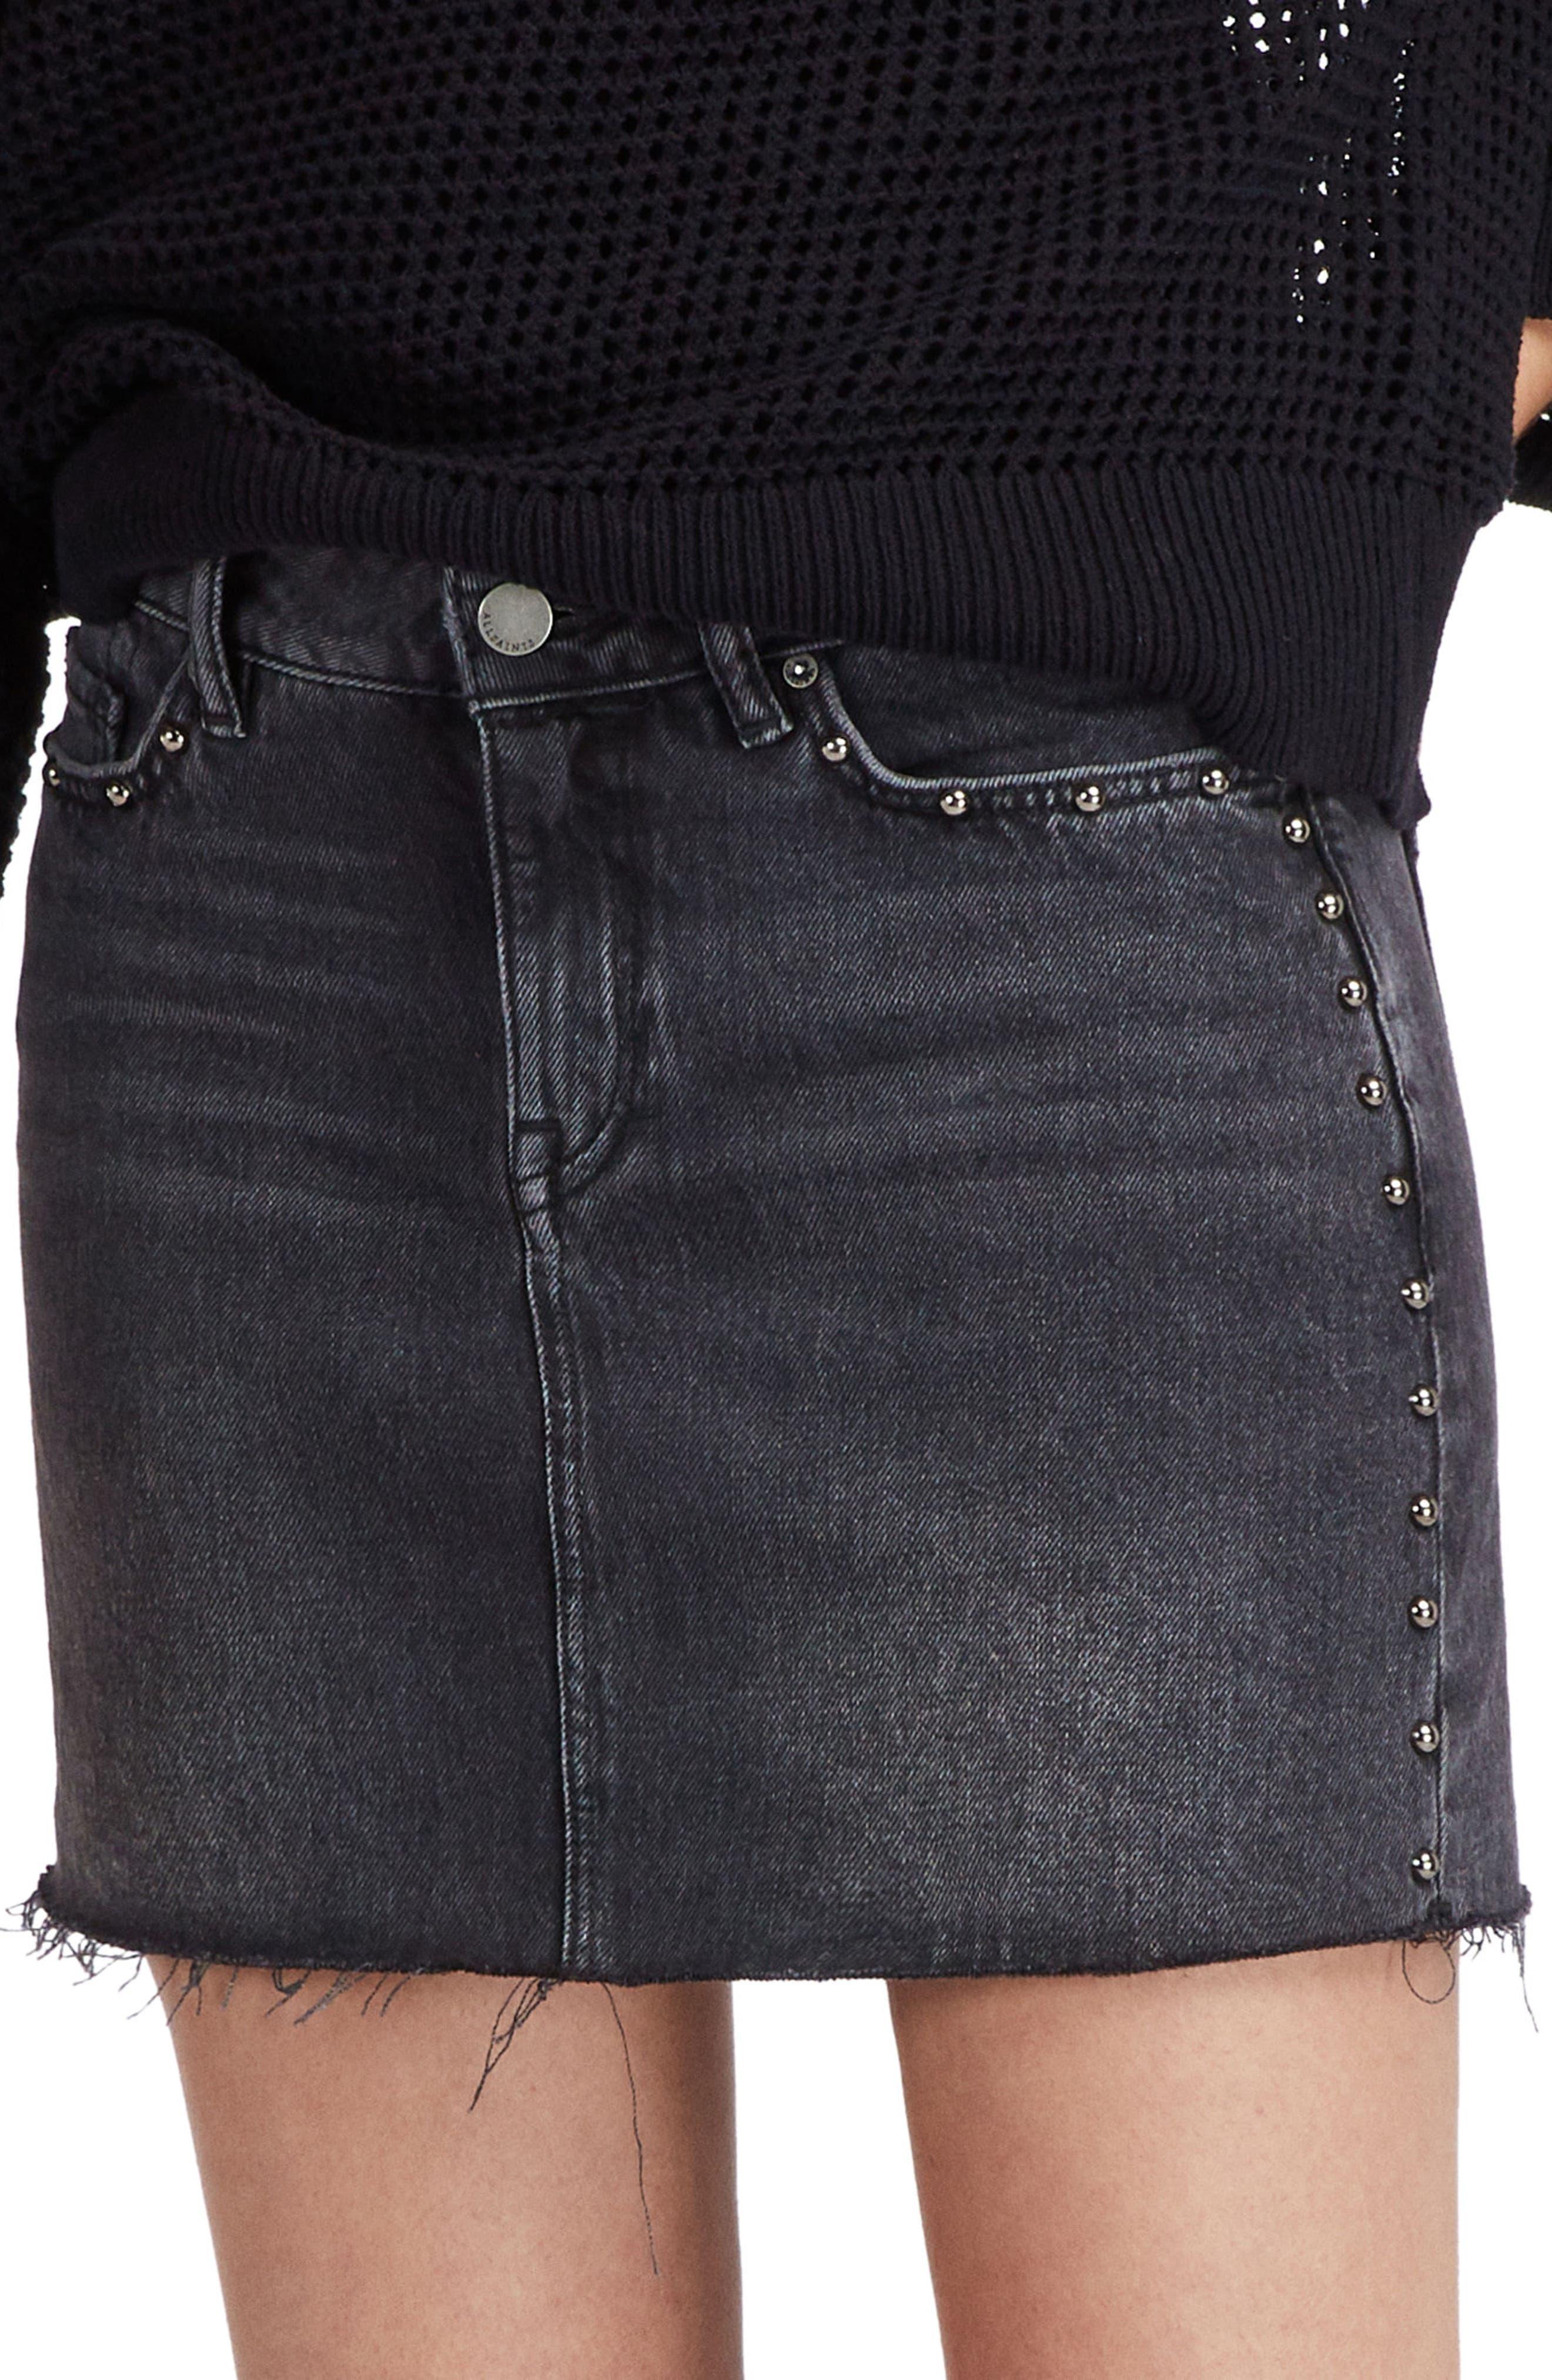 Studded Denim Skirt,                             Alternate thumbnail 3, color,                             Washed Black